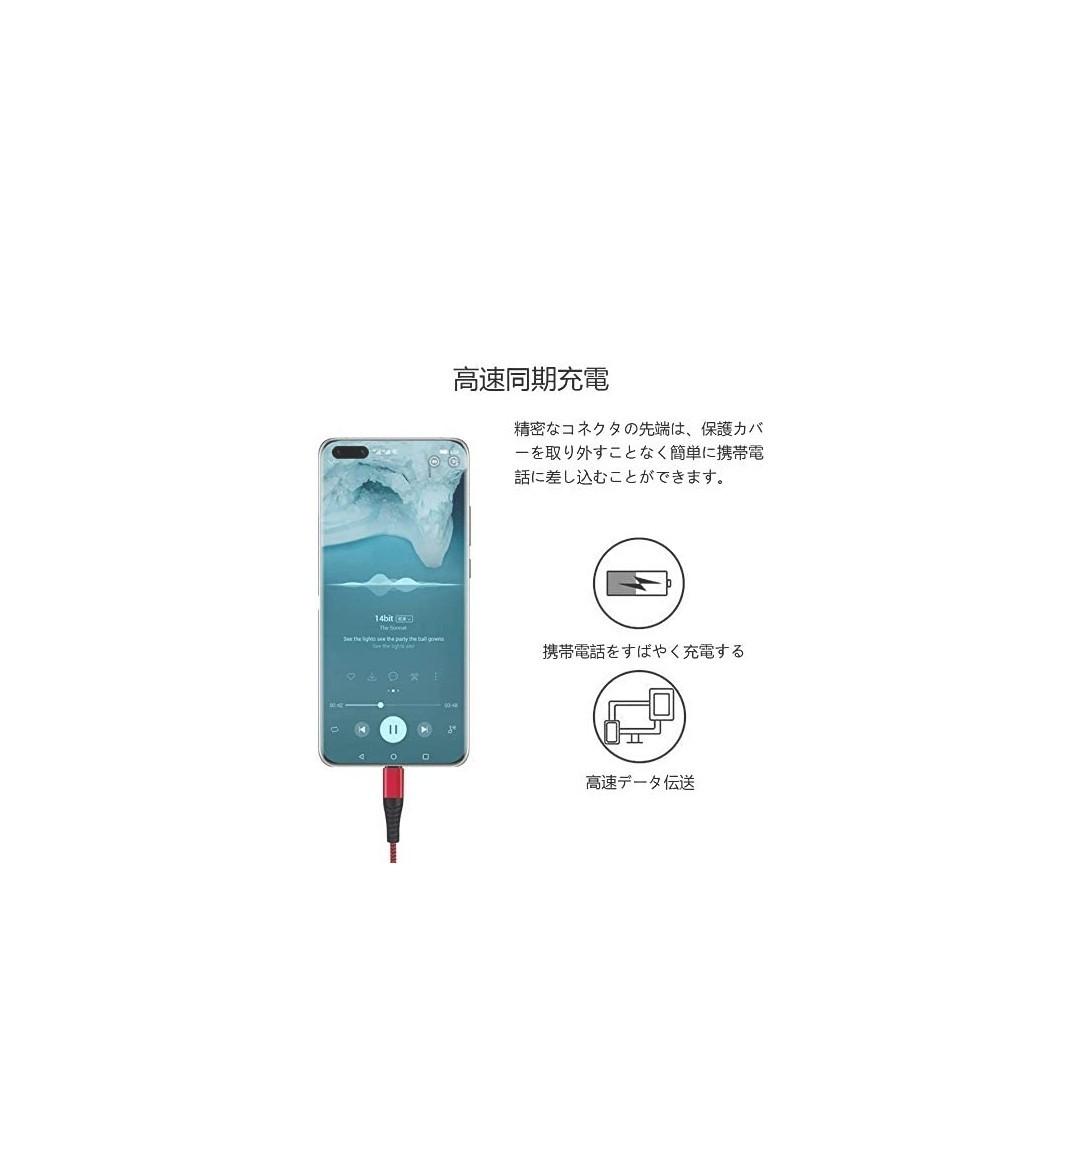 USB Type C ケーブル 3A 急速充電 3本セット 1m + 2m + 3m